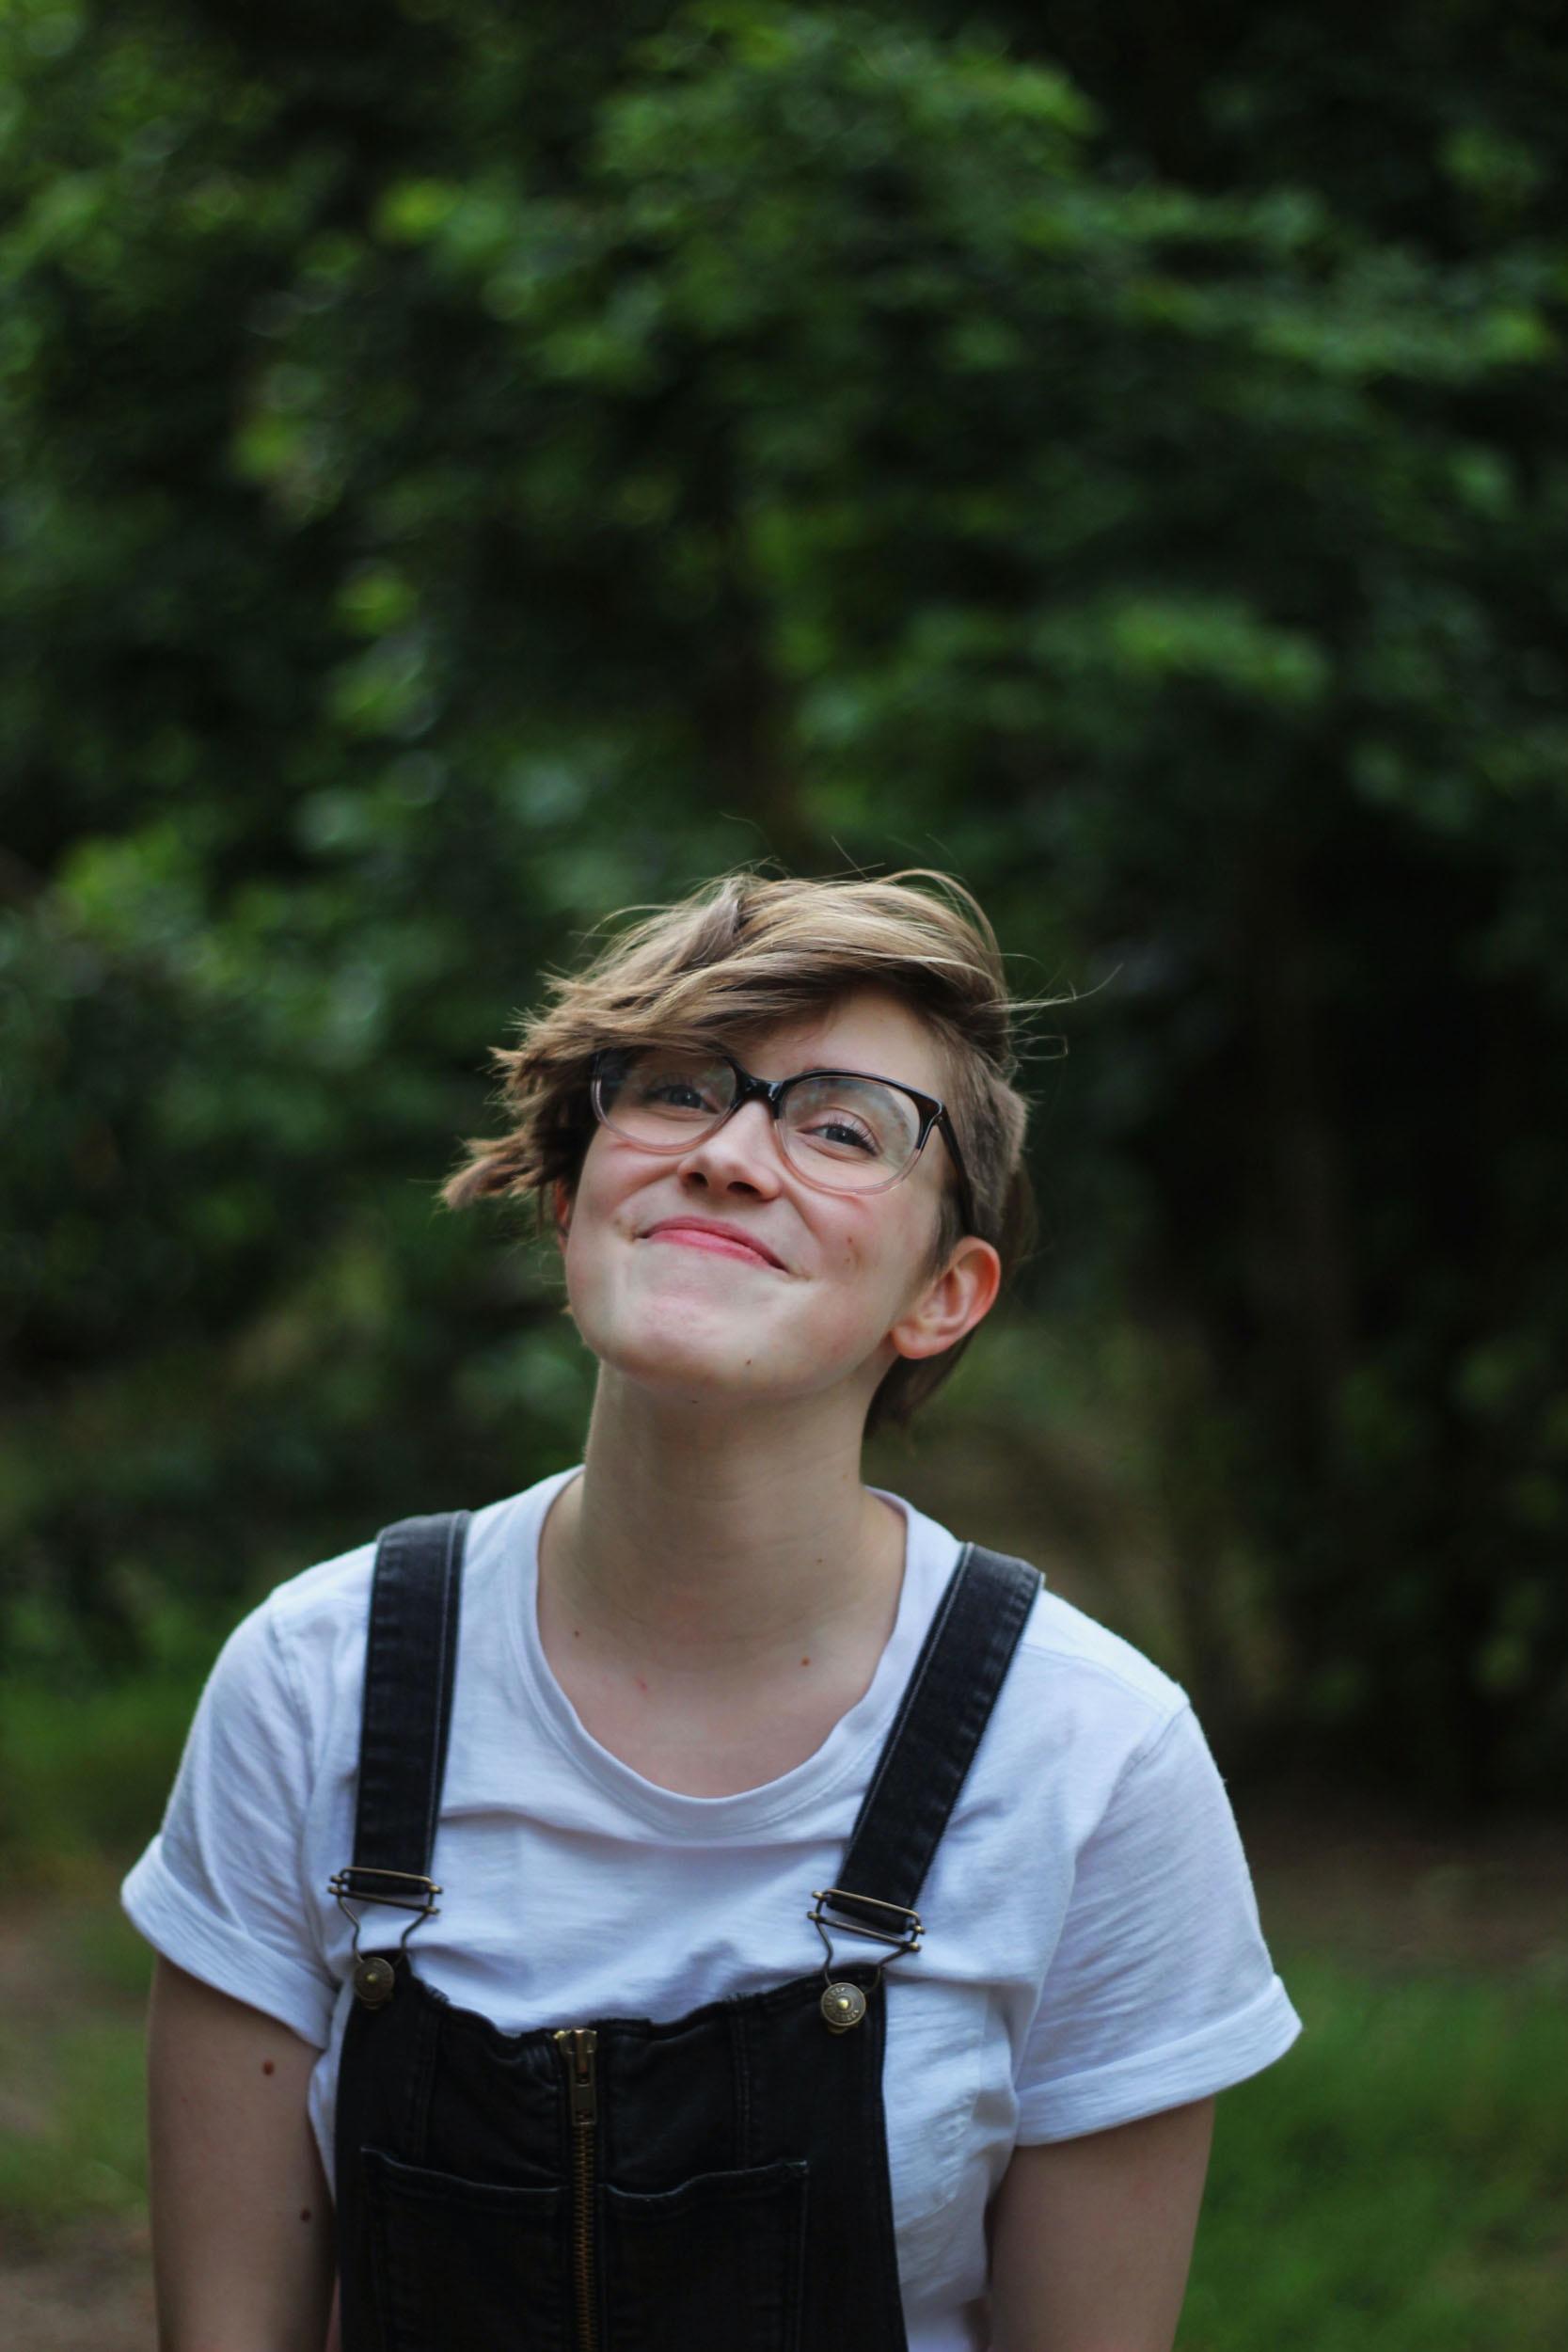 Go to Elyssa Fahndrich's profile